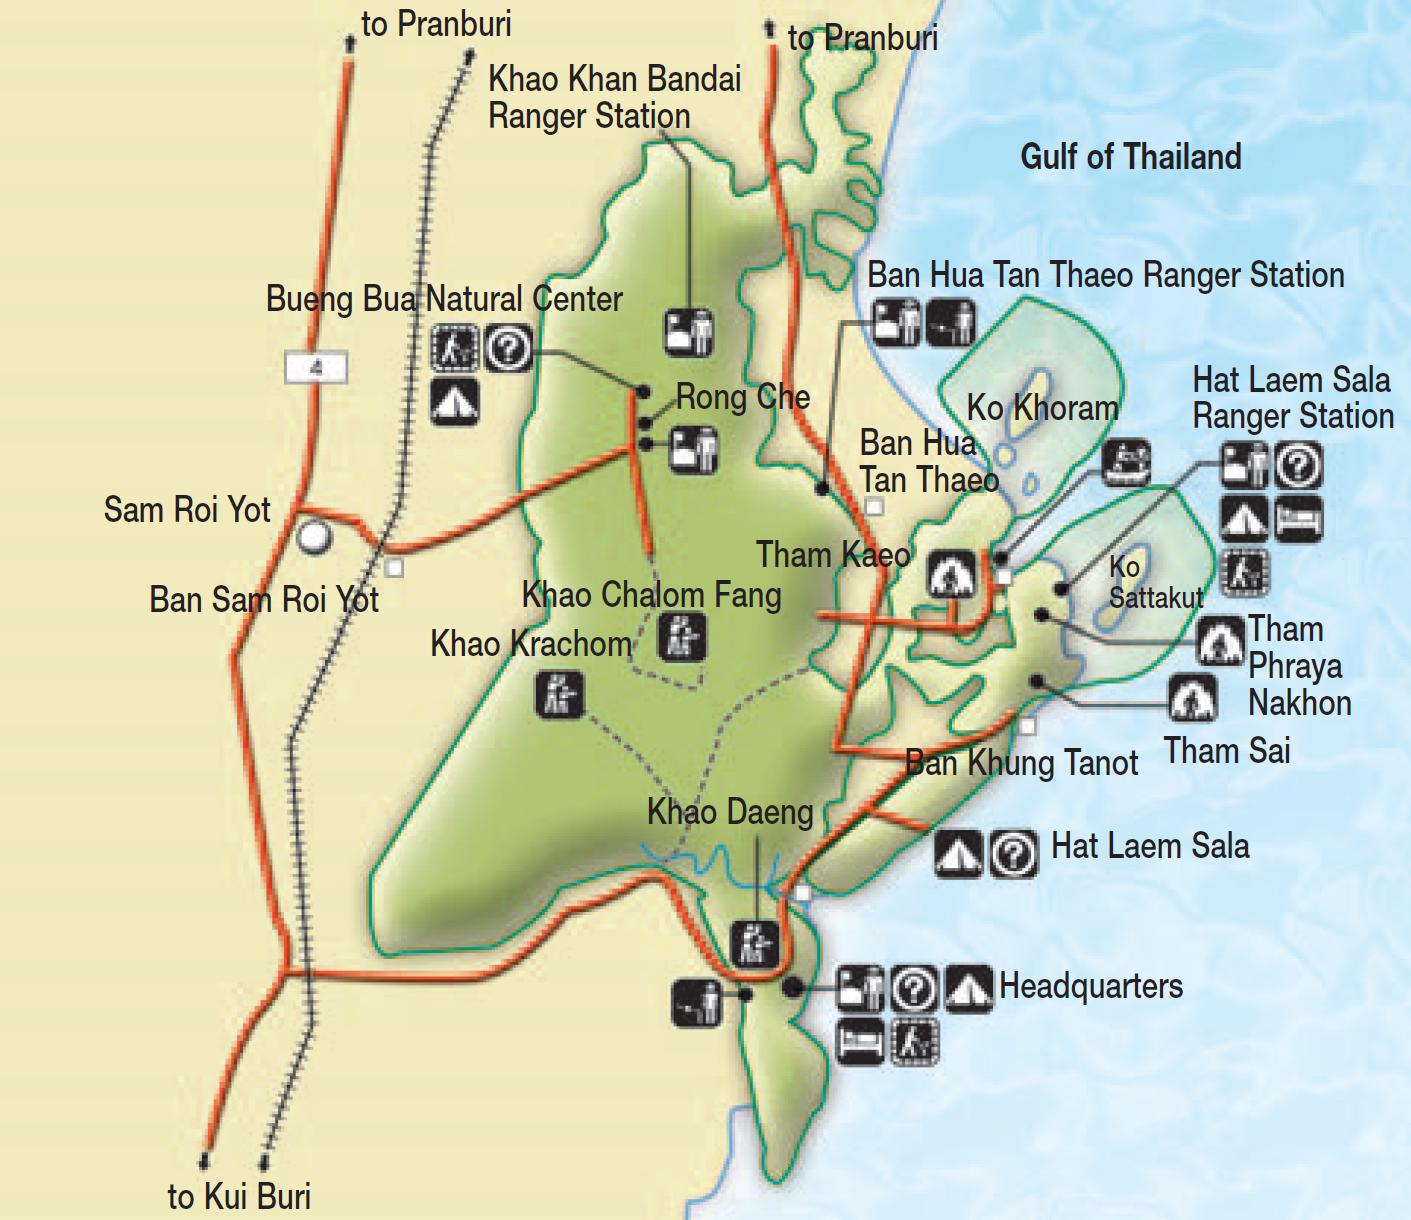 Prachuab Khiri Khan maps